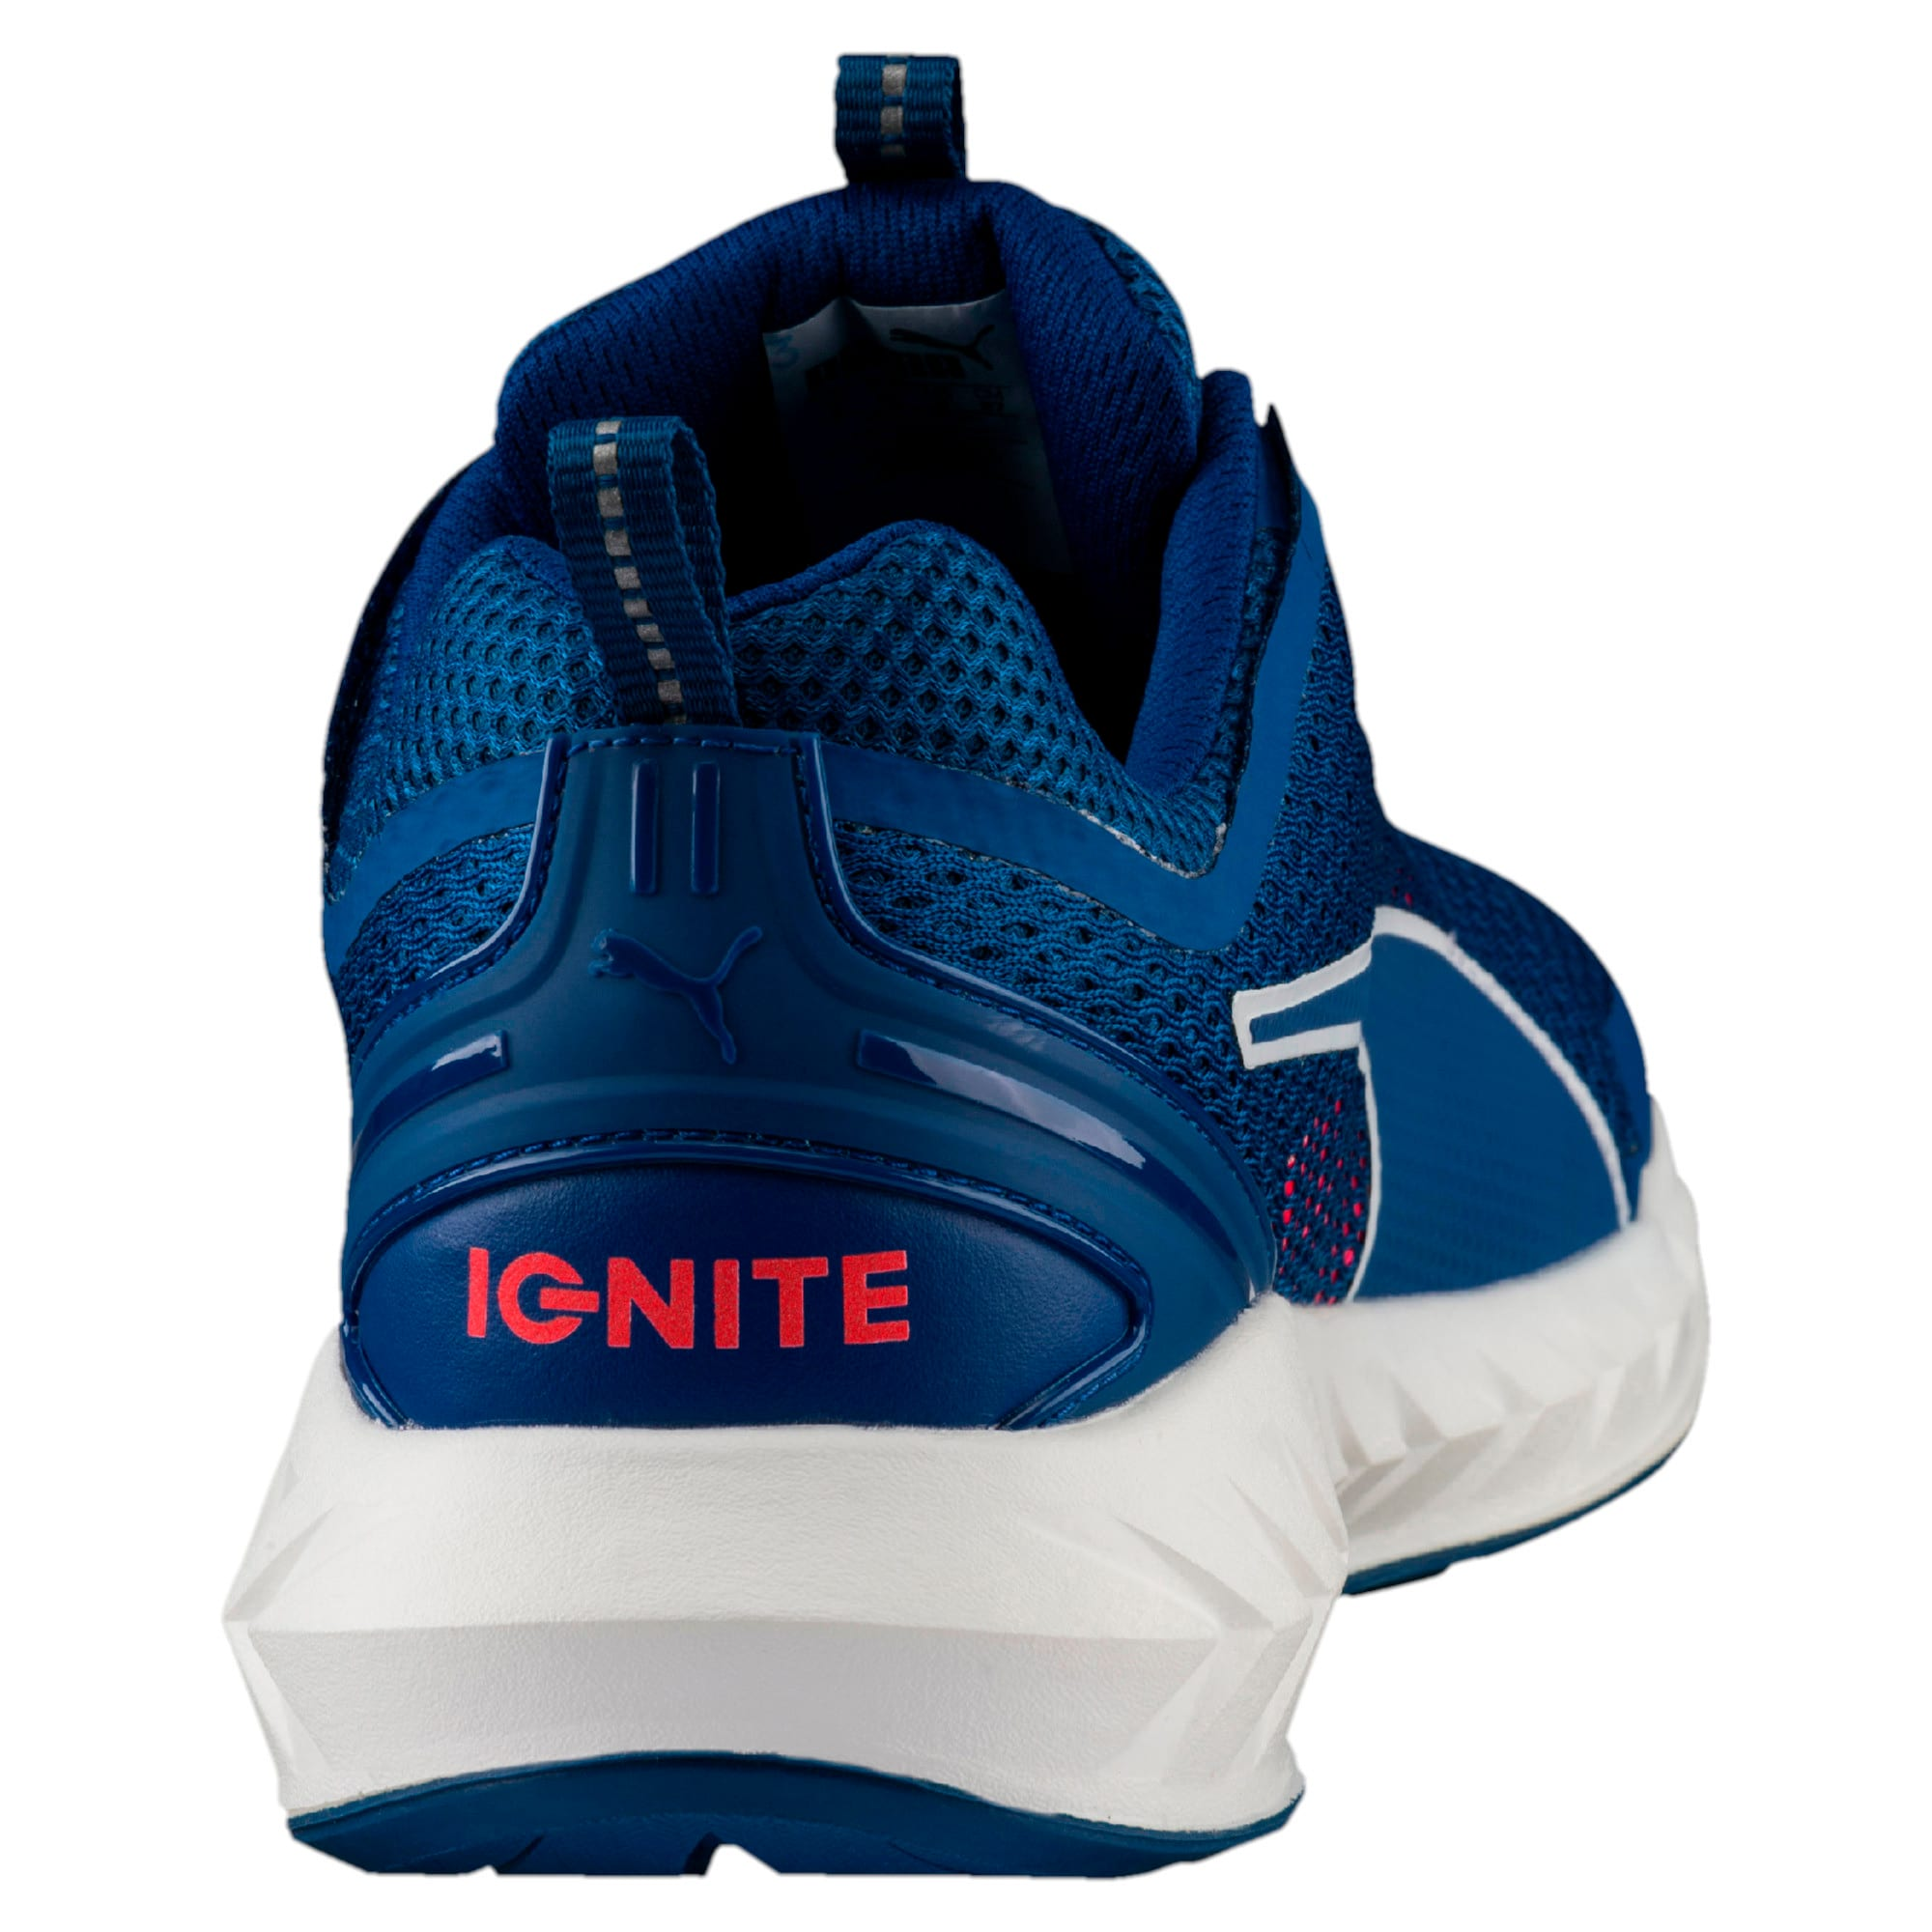 Thumbnail 3 of IGNITE Ultimate 2 Men's Running Shoes, TRUE BLUE-Bright Plasma, medium-IND